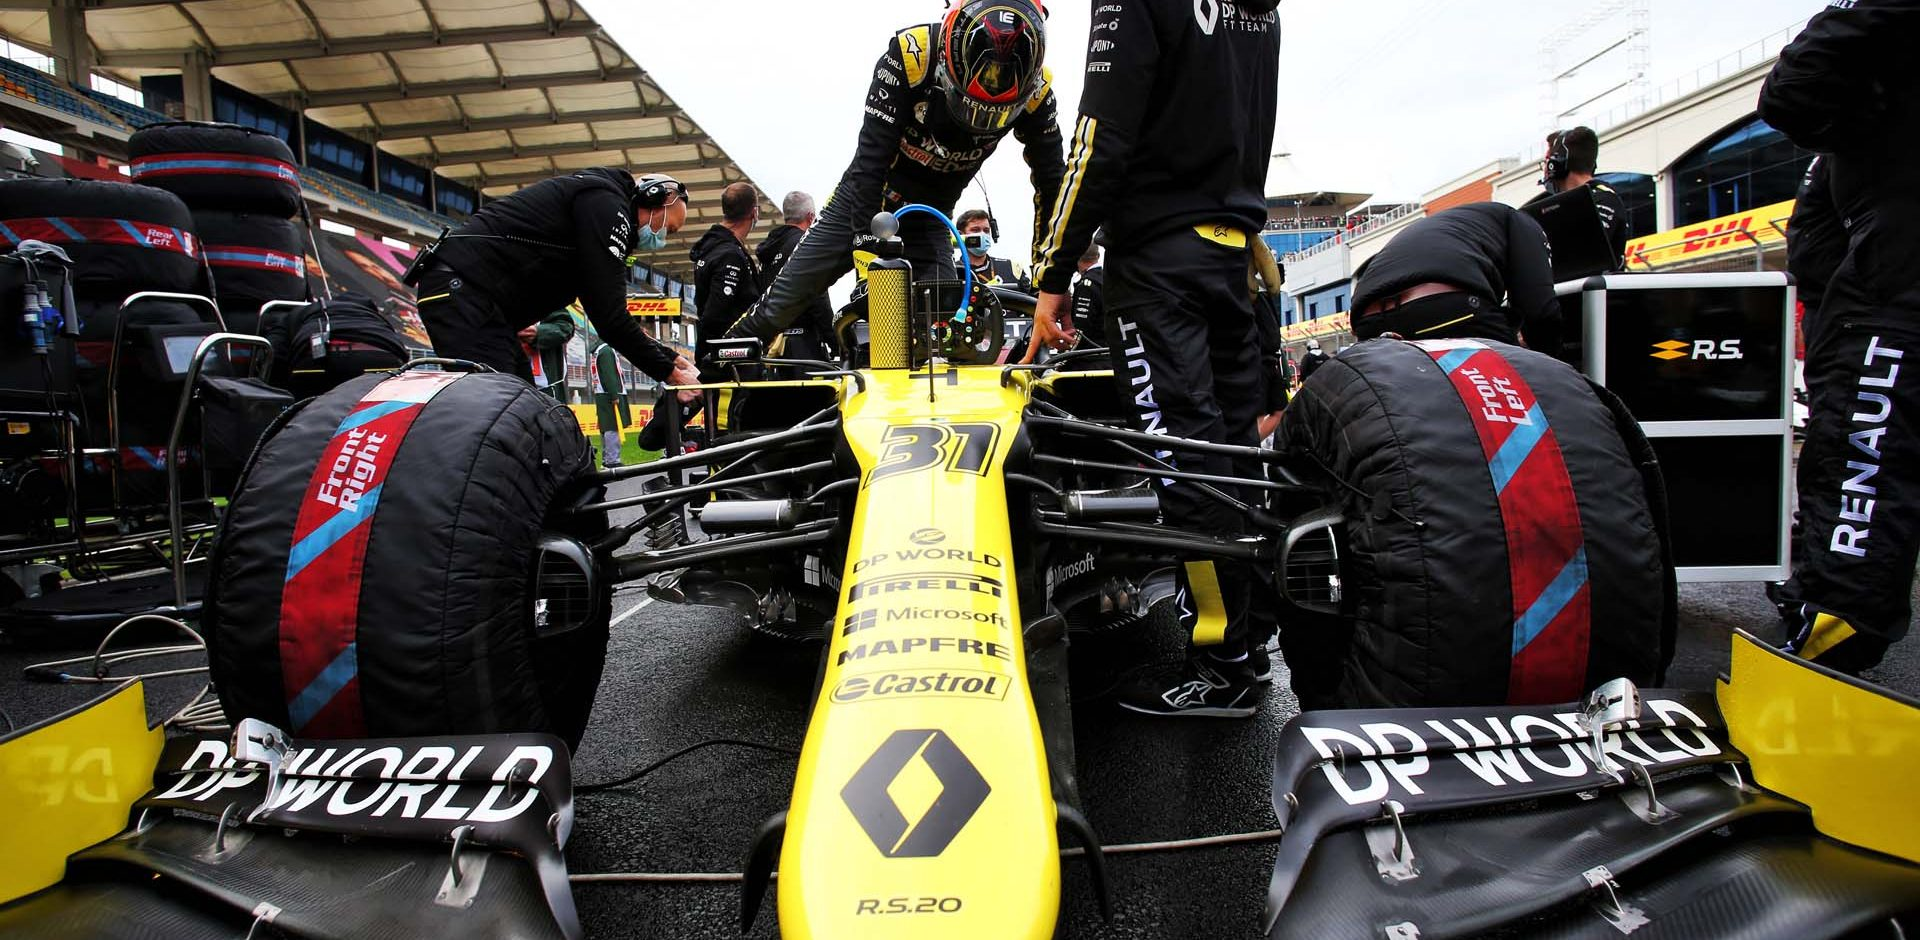 Esteban Ocon (FRA) Renault F1 Team RS20 on the grid. Turkish Grand Prix, Sunday 15th November 2020. Istanbul, Turkey.